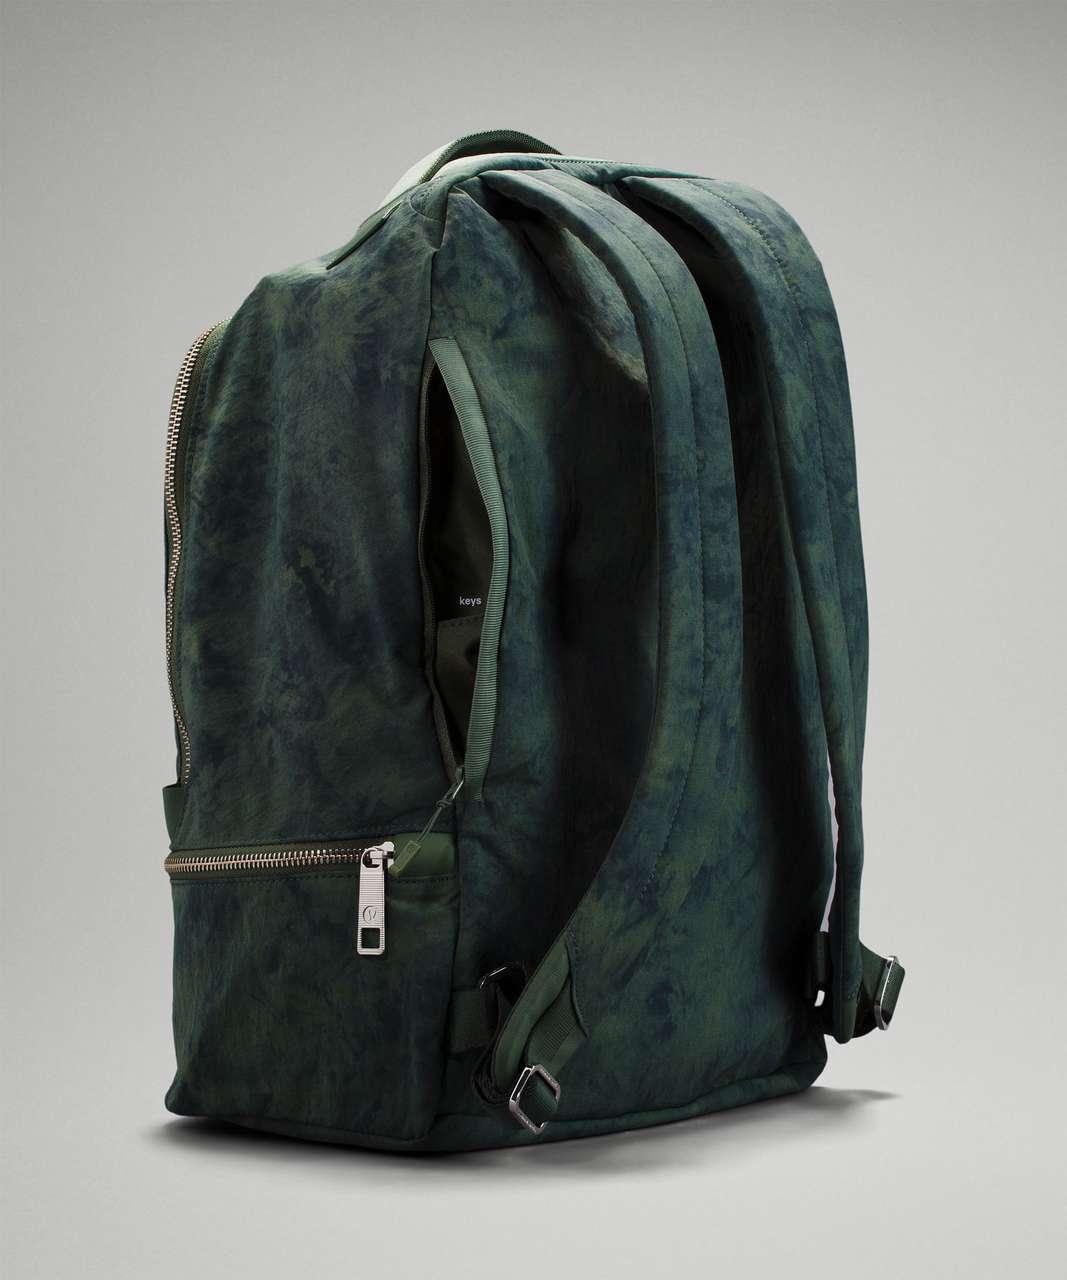 Lululemon City Adventurer Backpack 17L - Aquila Green Twill Multi